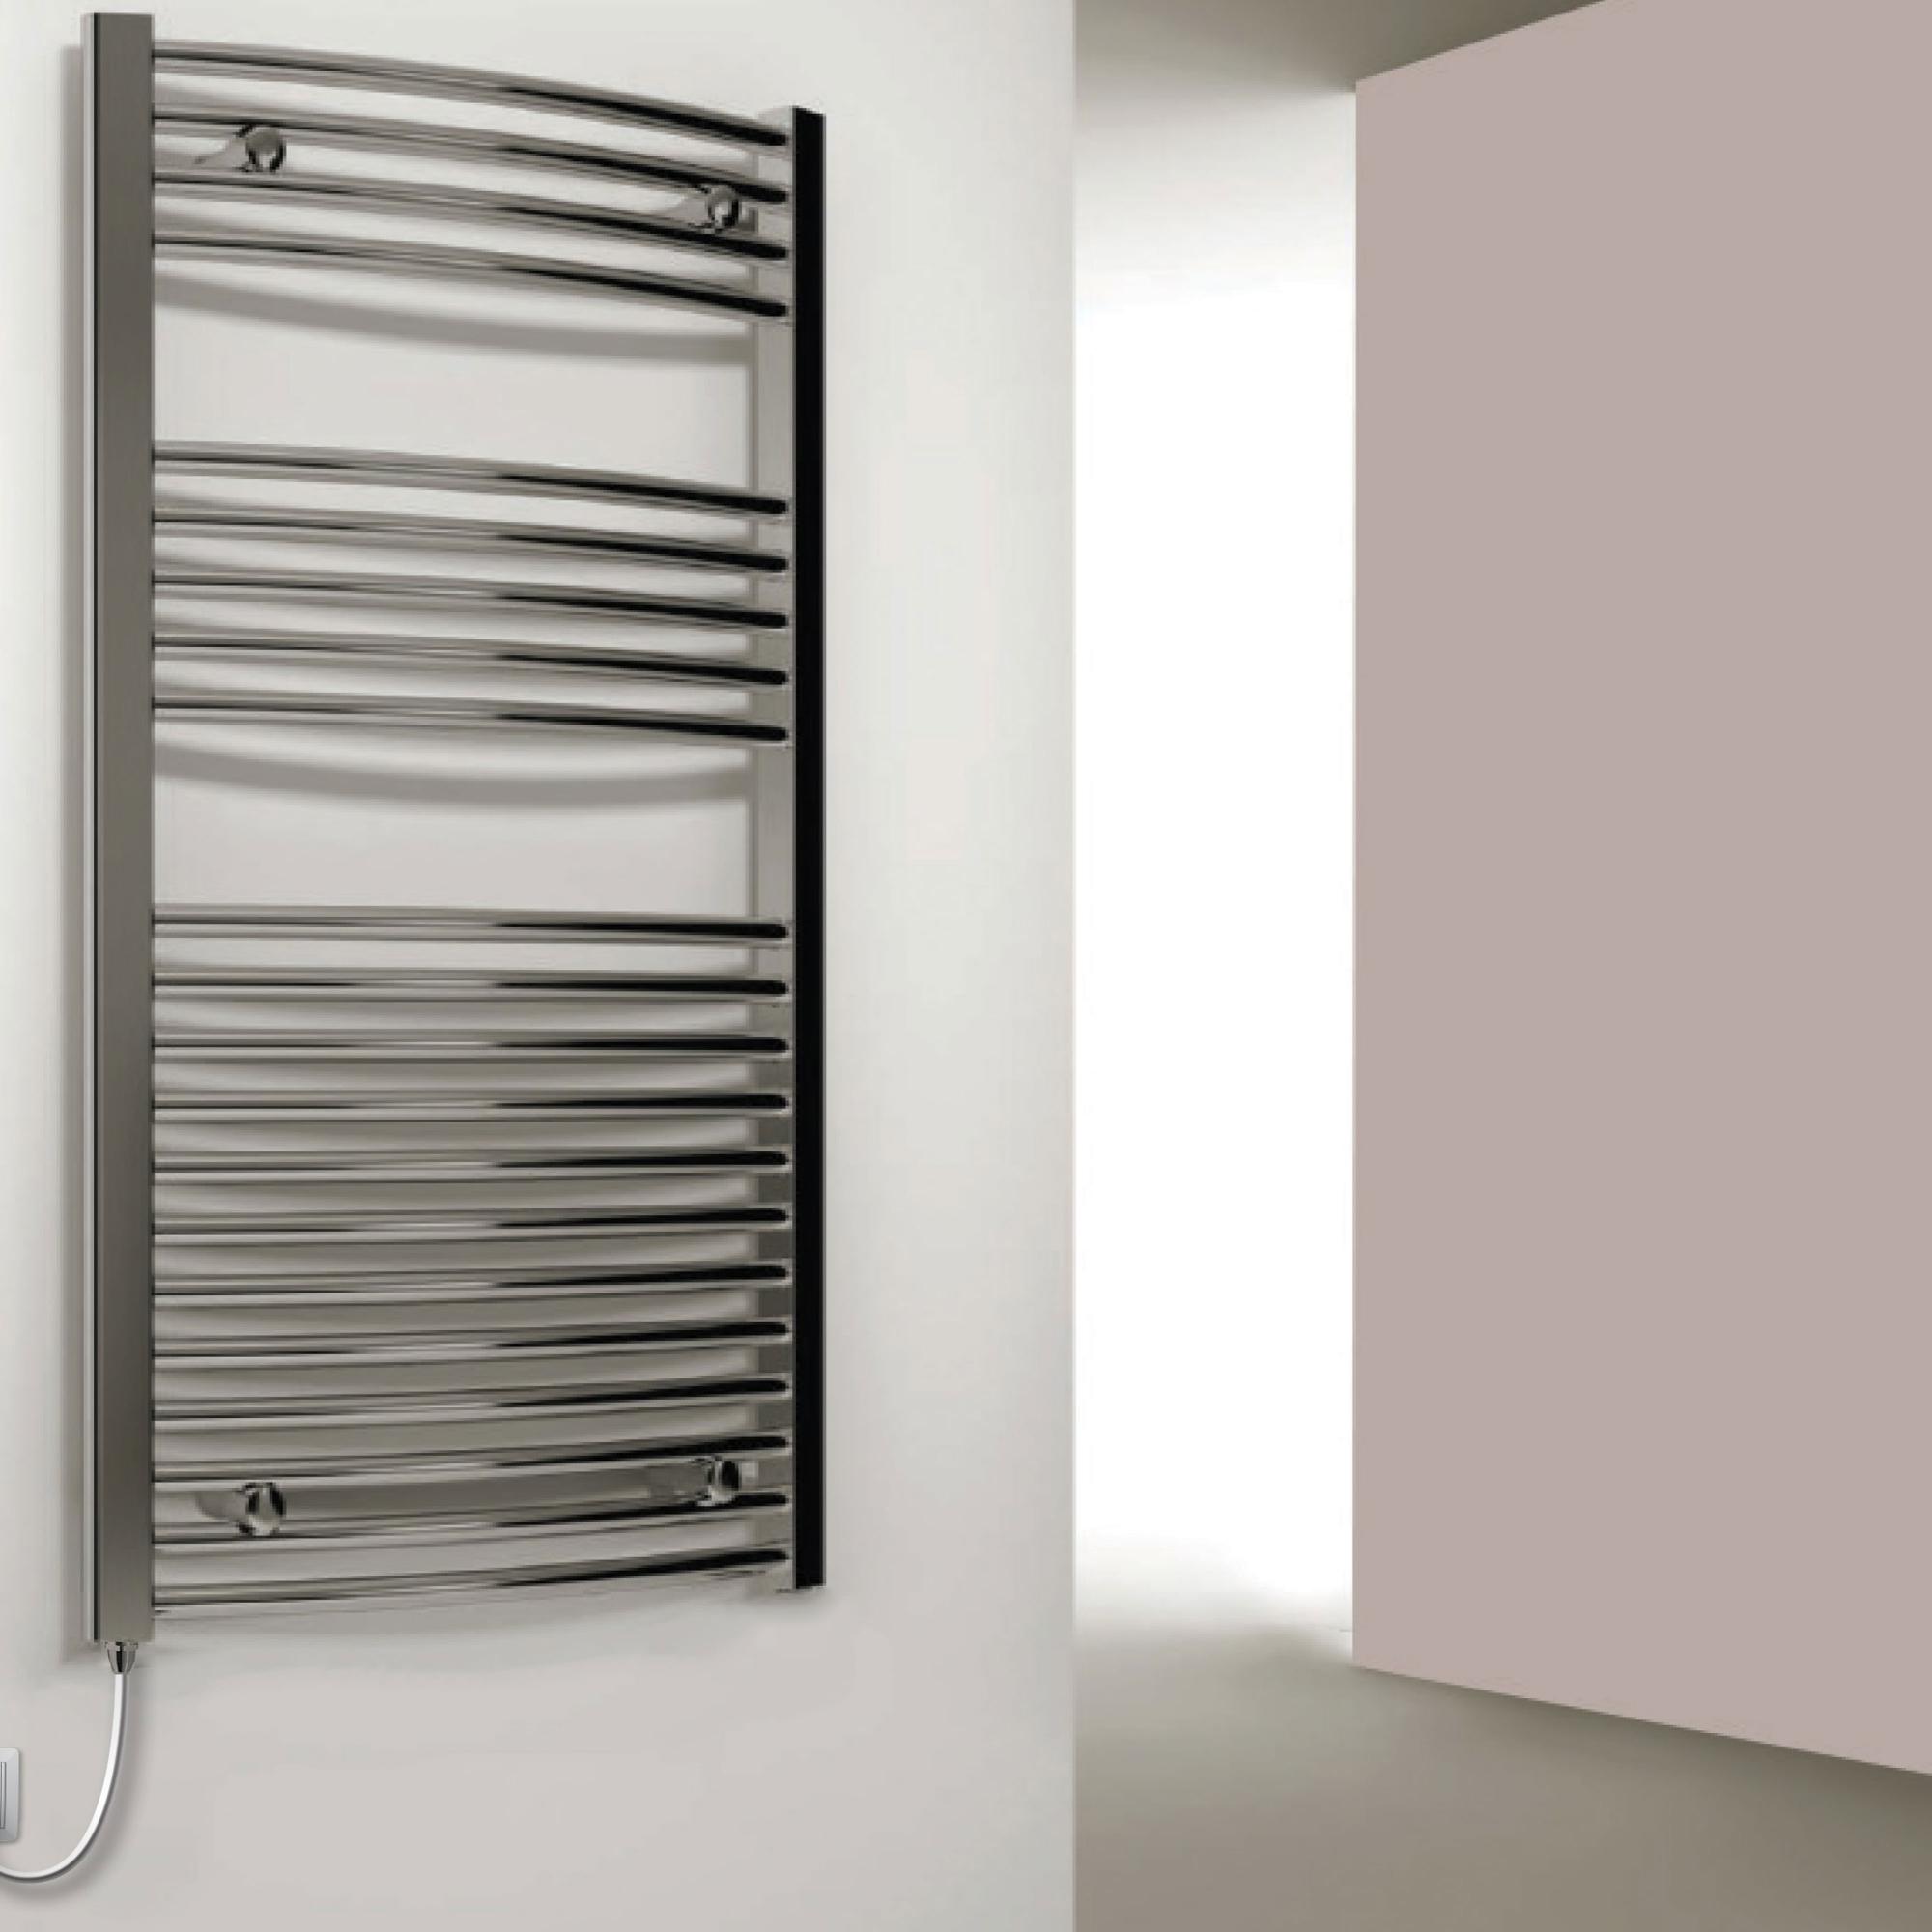 Reina Capo Curved Electric Heated Towel Rail 1600mm H x 500mm W Chrome-0